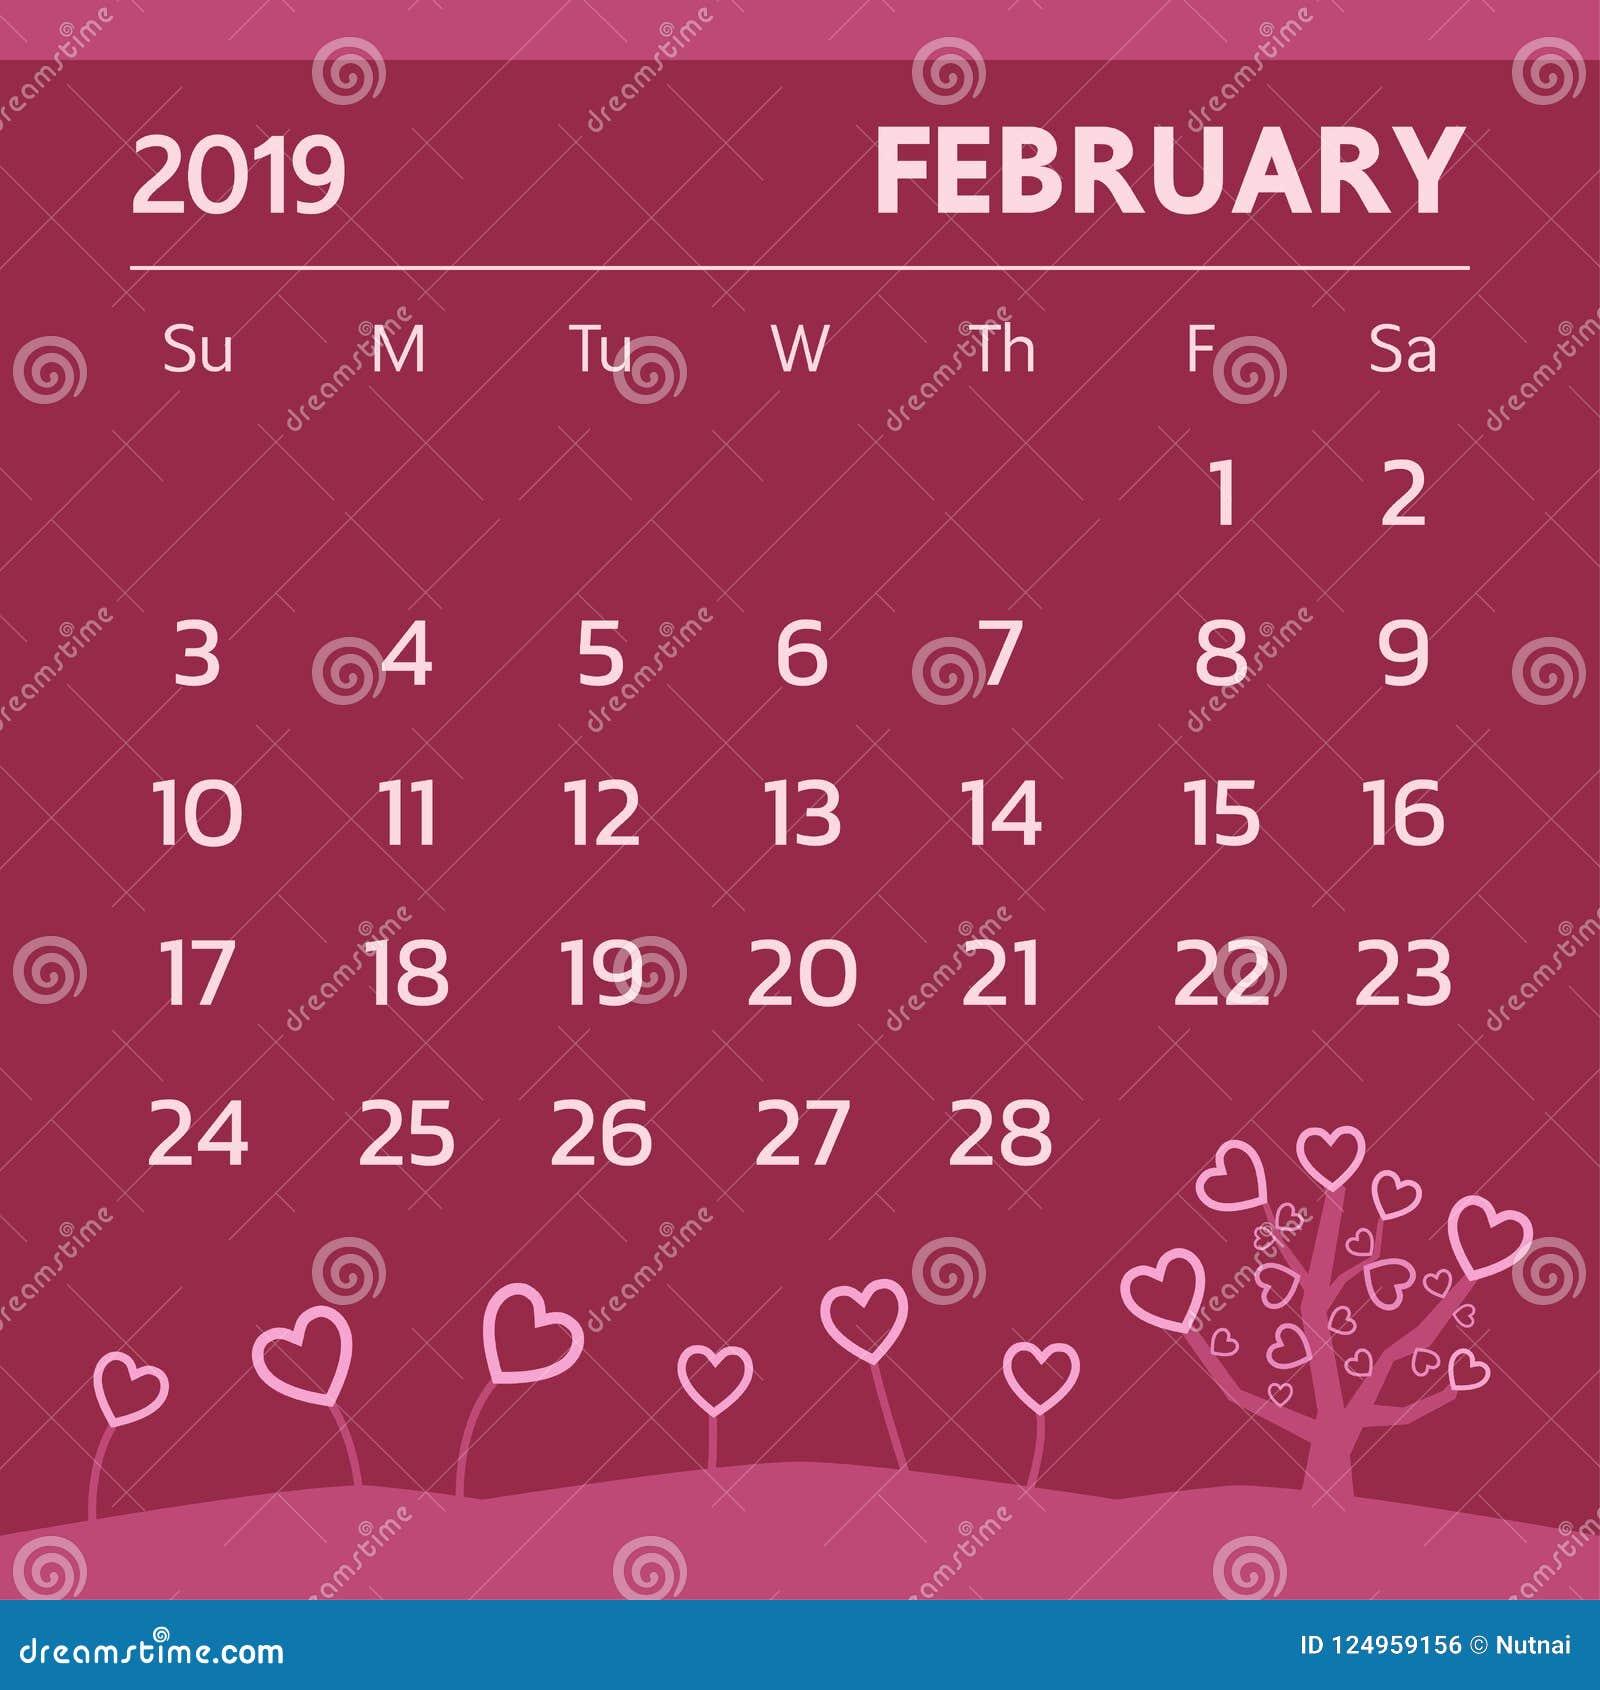 Calendar February 2019 Valentine Calendar For February 2019 With Valentine Theme   Vector Stock